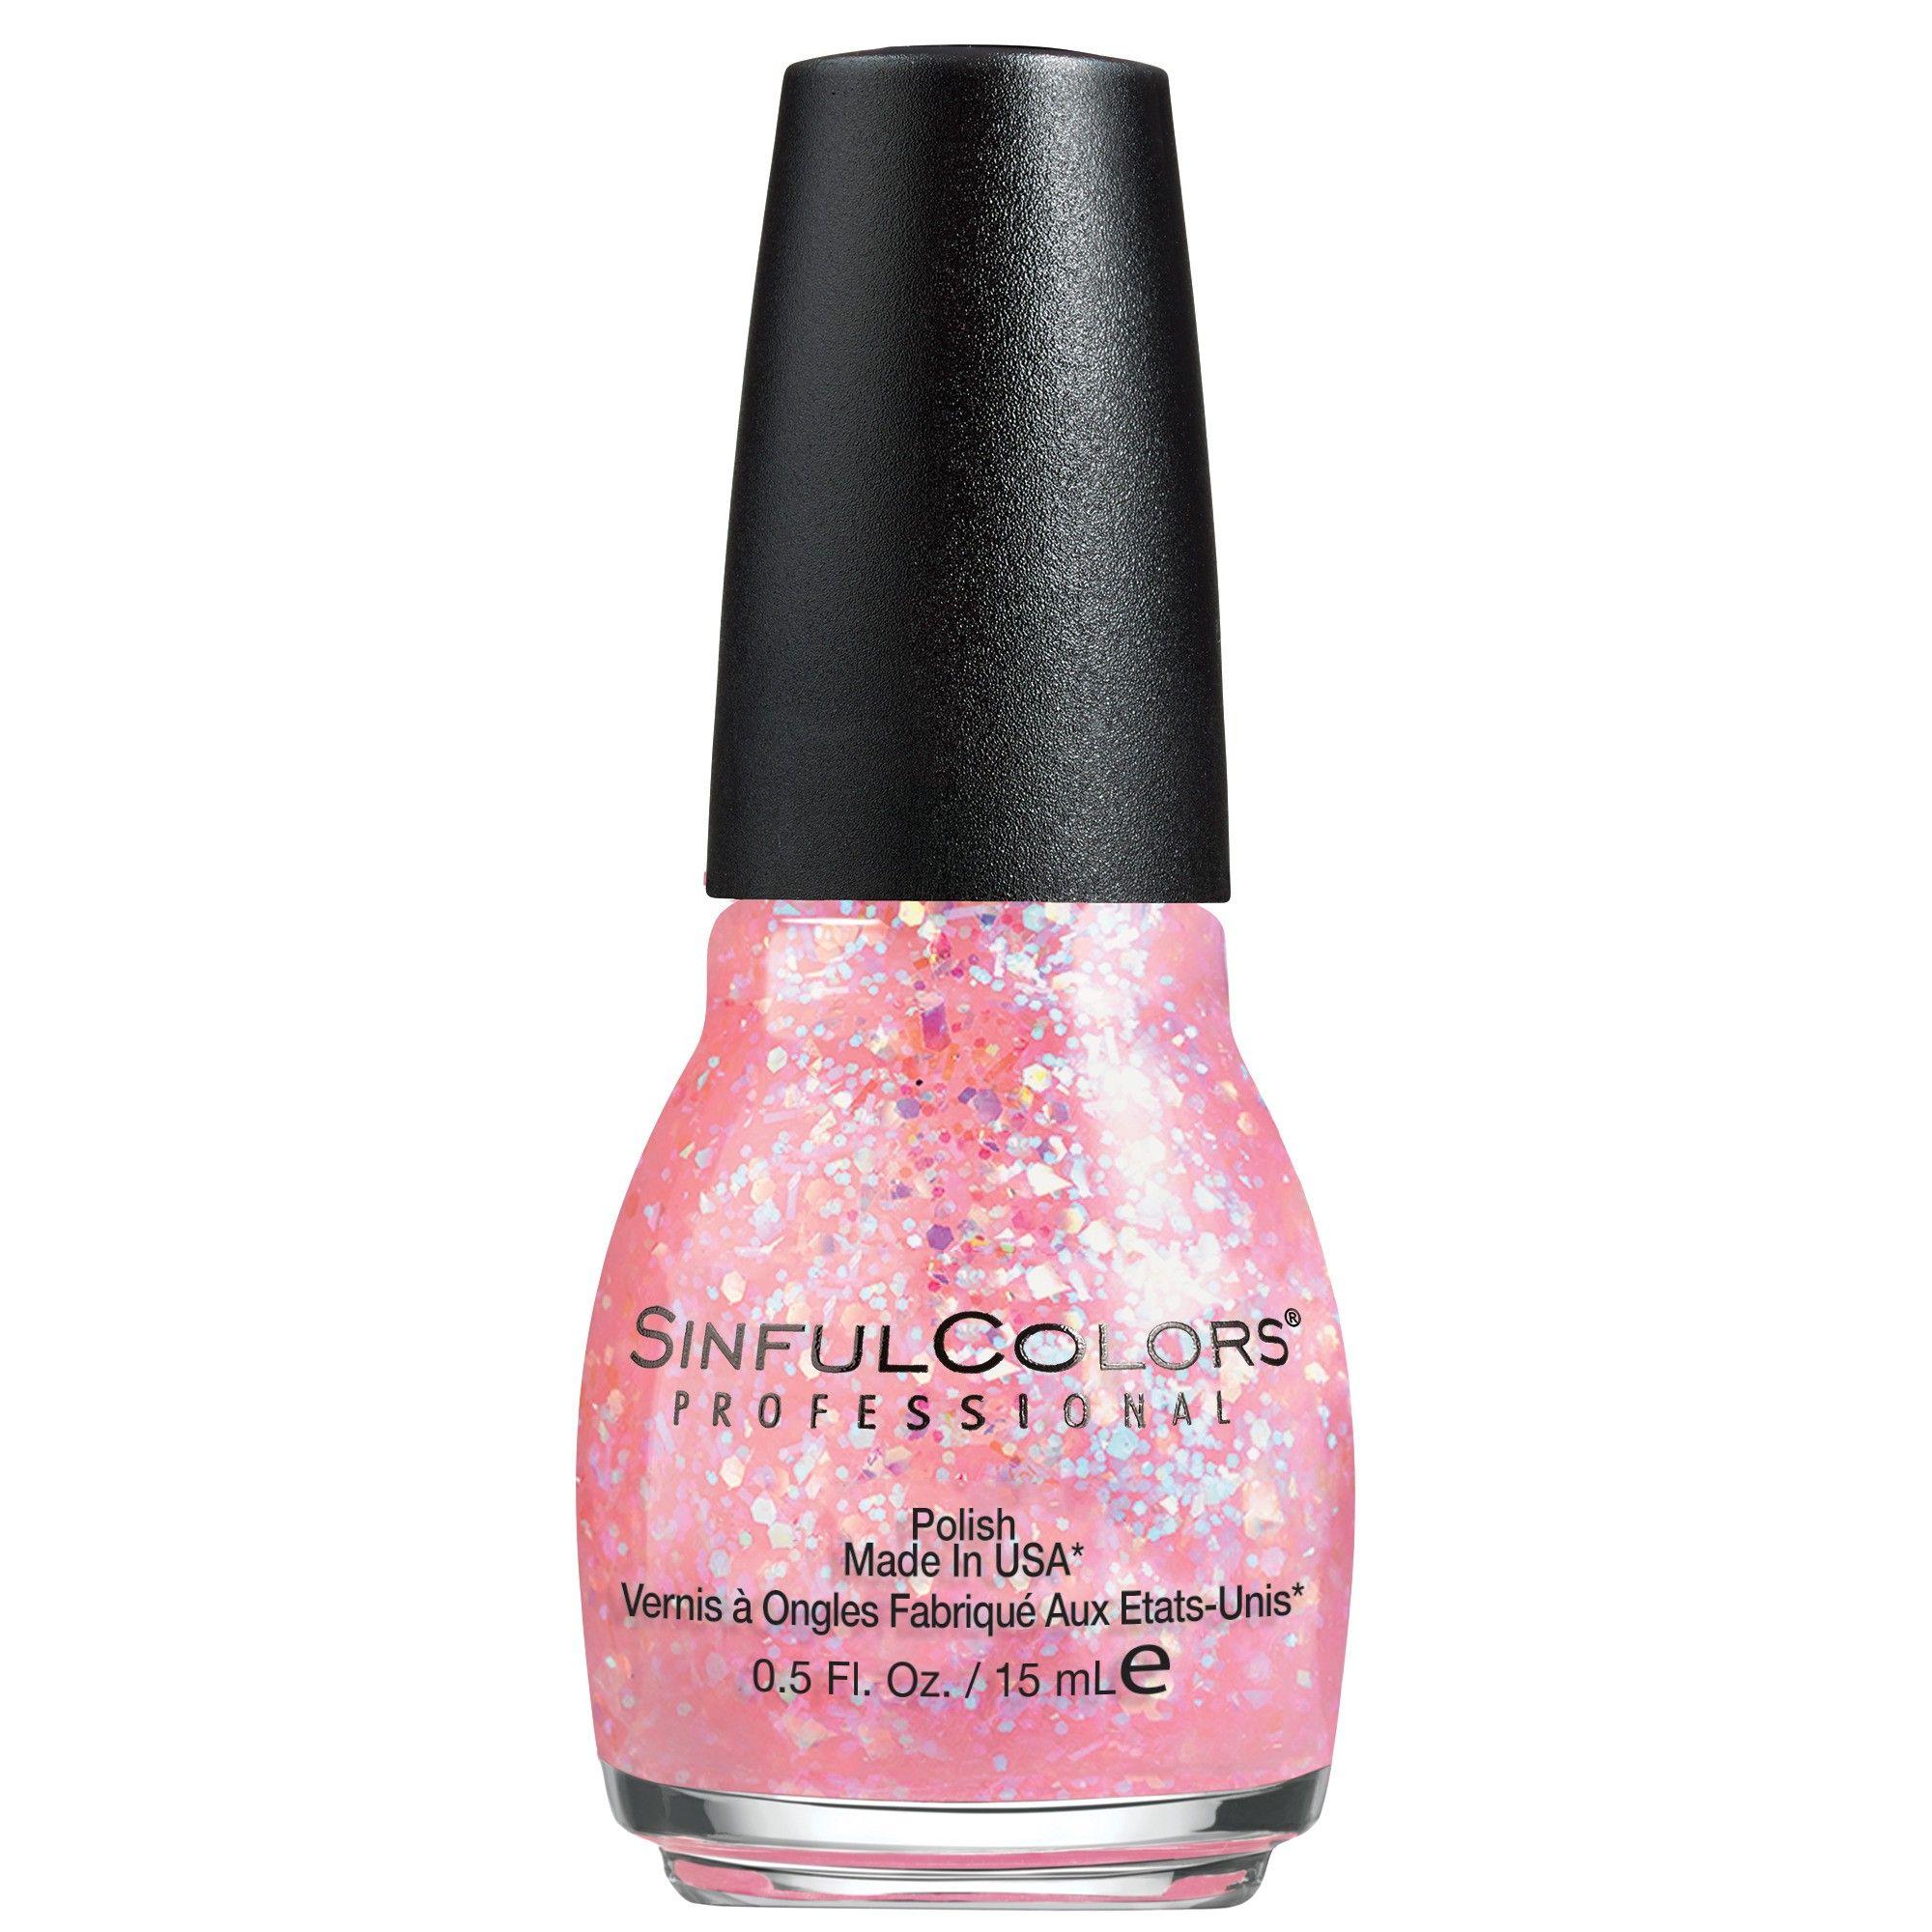 Sinful Colors Nail Polish - Pinky Glitter - 0.5 fl oz ...